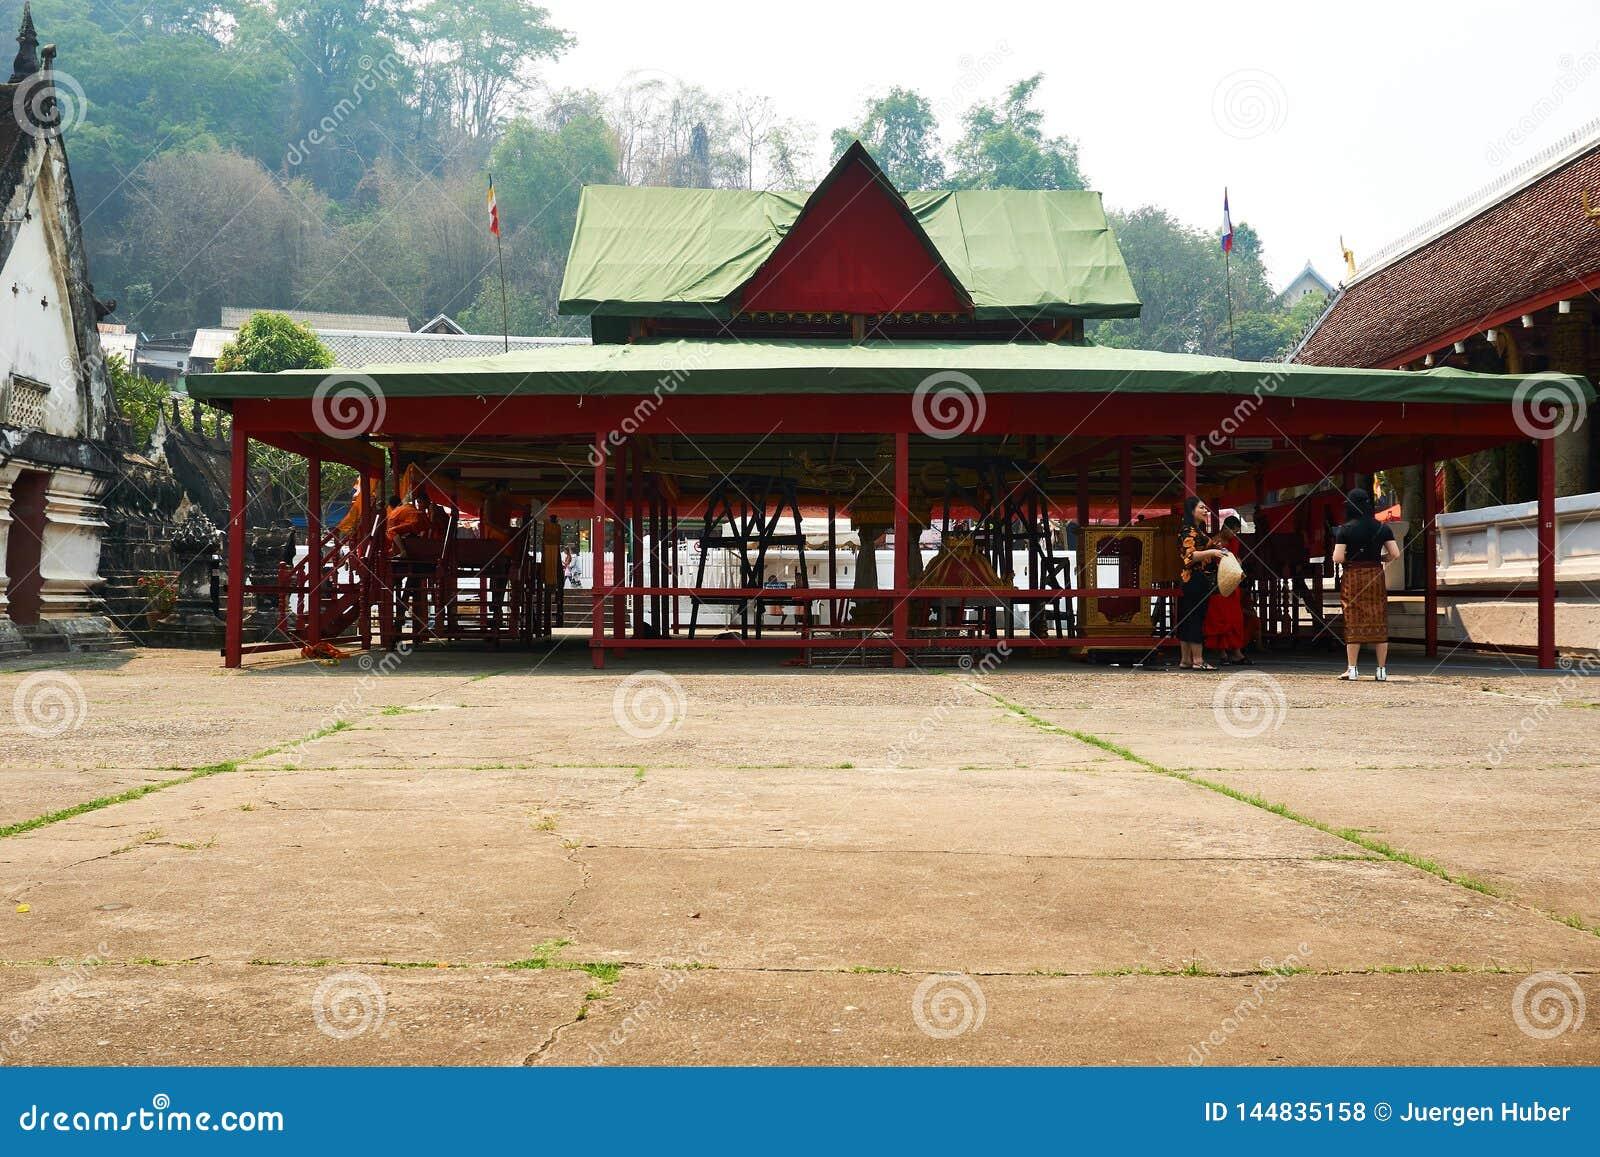 LUANG PRABANG, LAOS - 14 AVRIL 2019 Les MOINES s asseyent dans le temple à l AMI de pi Lao New Year, grand festival de l eau